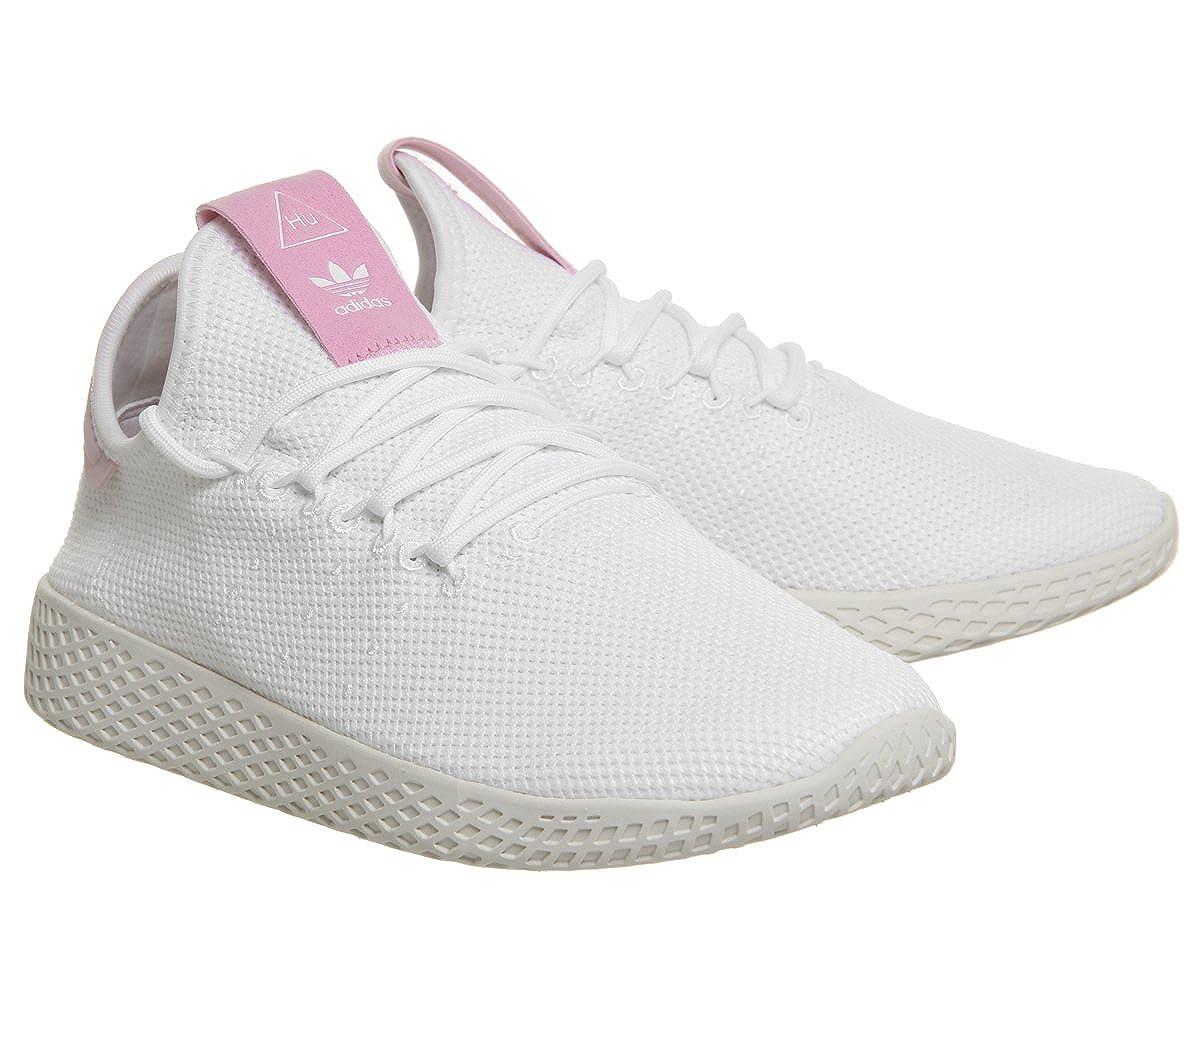 adidas Pharrell Williams x Tennis HU W DB2558, Basket, Blanc